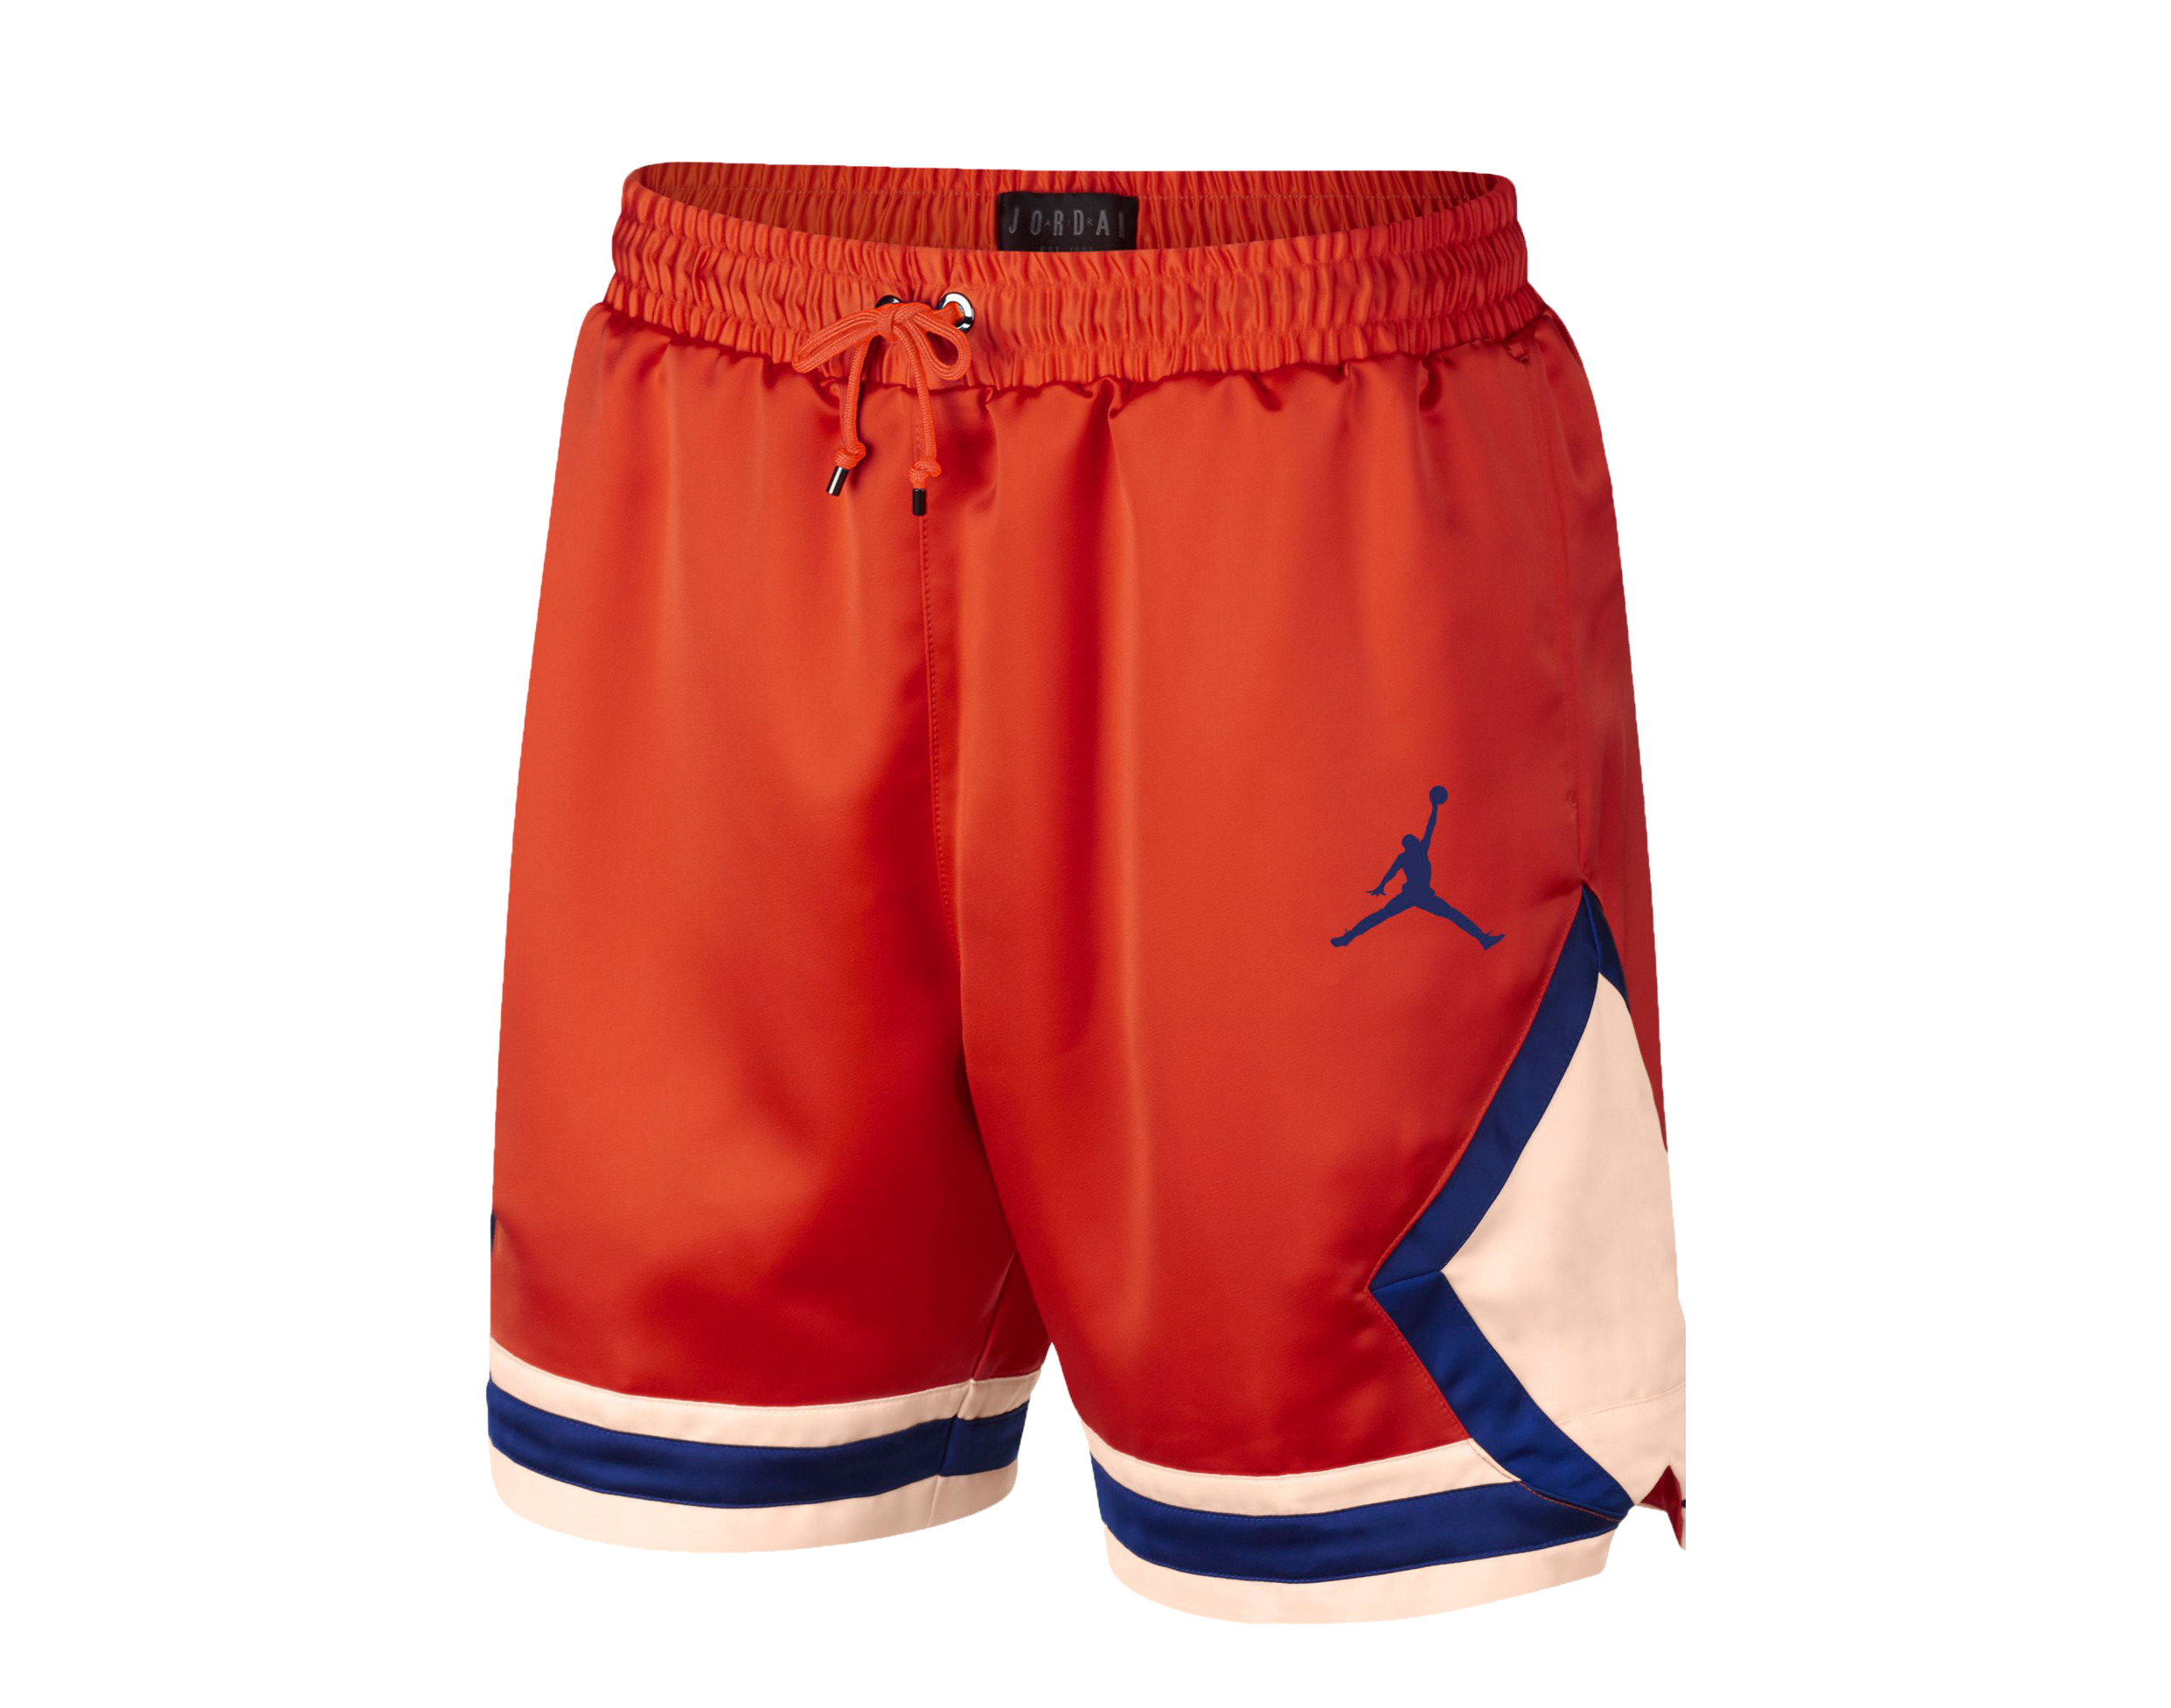 Nike Air Jordan Satin Diamond Orange